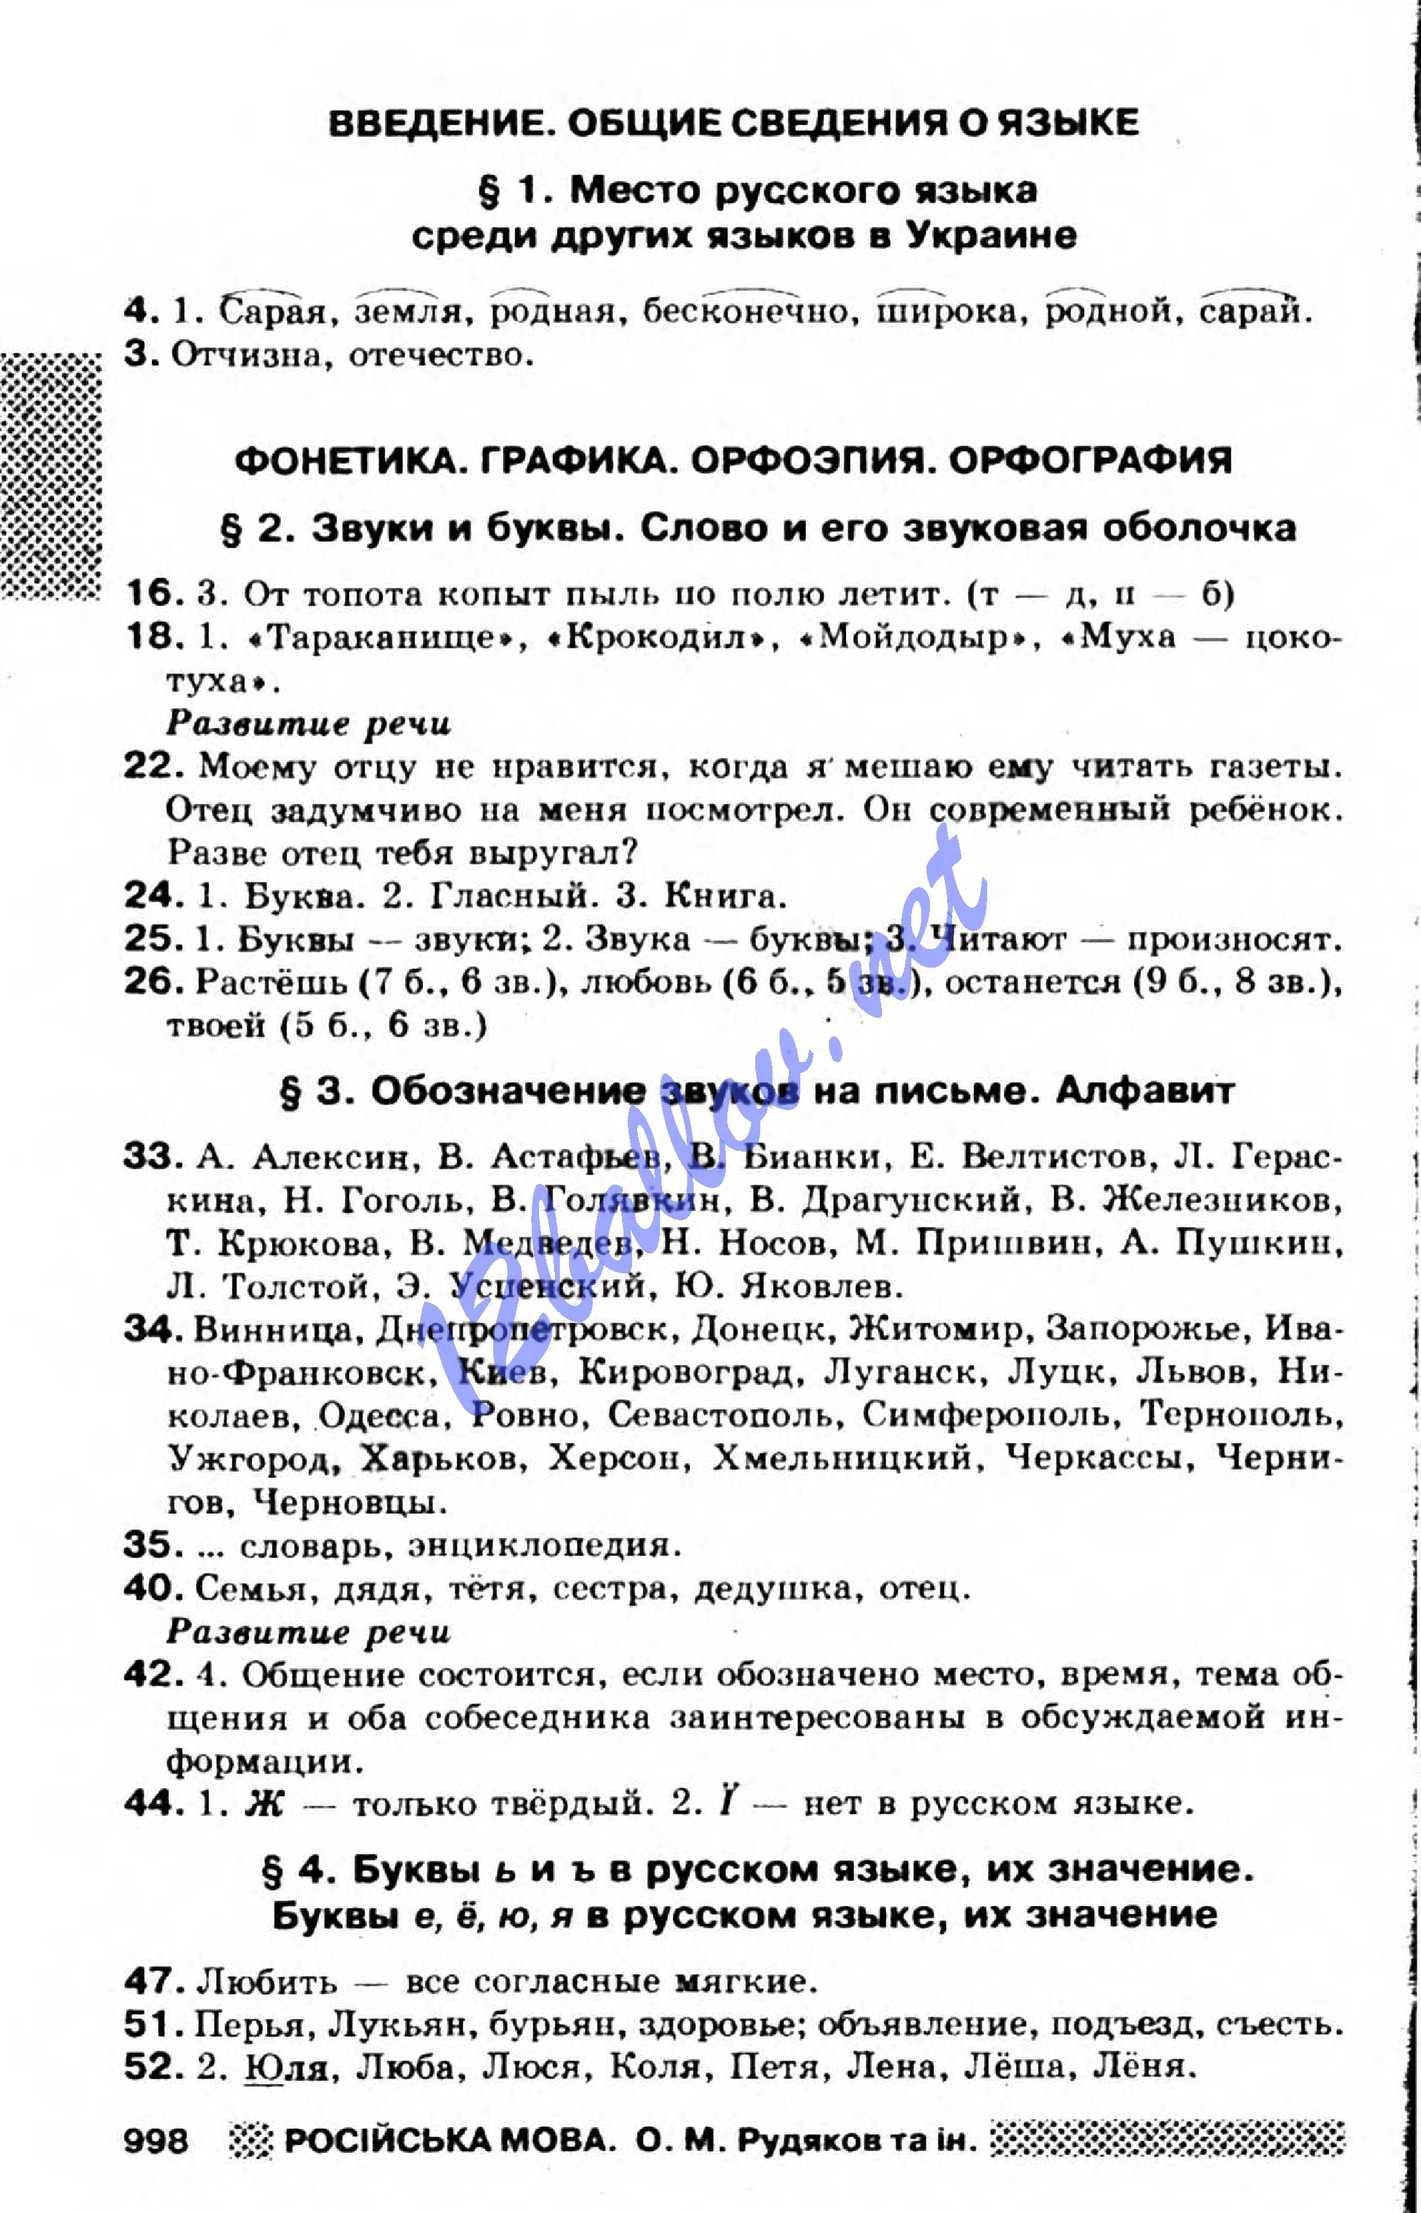 Гдз По Русскому Яз 5 Класс Рудякова